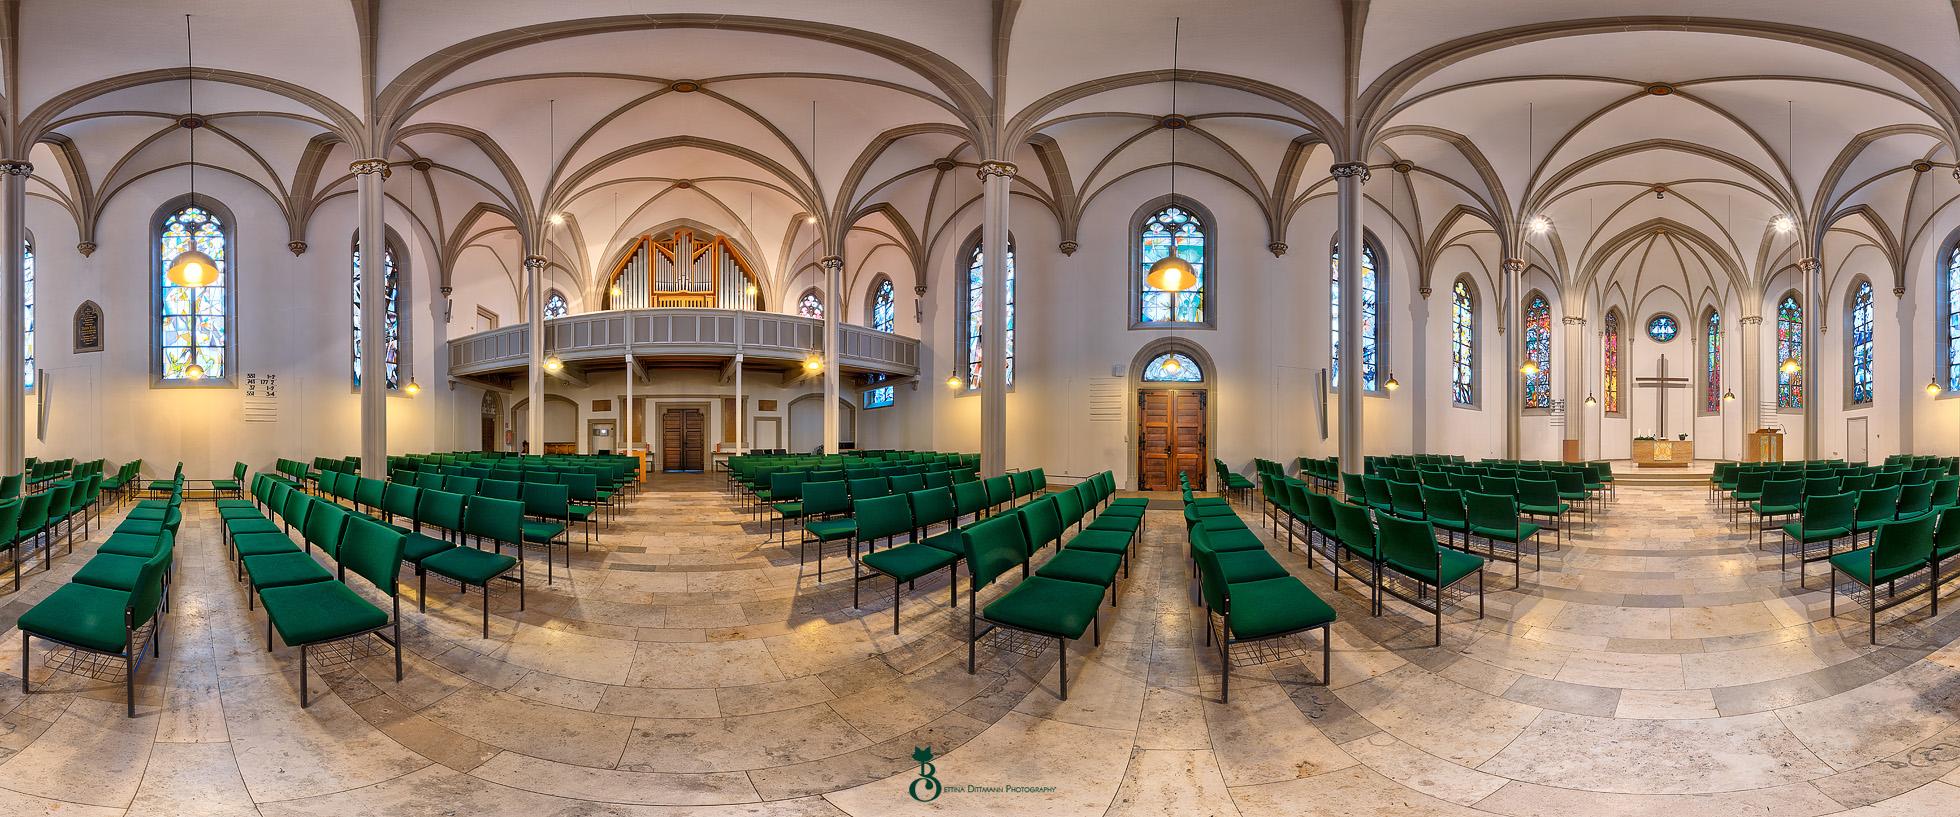 Stadtkirche 1